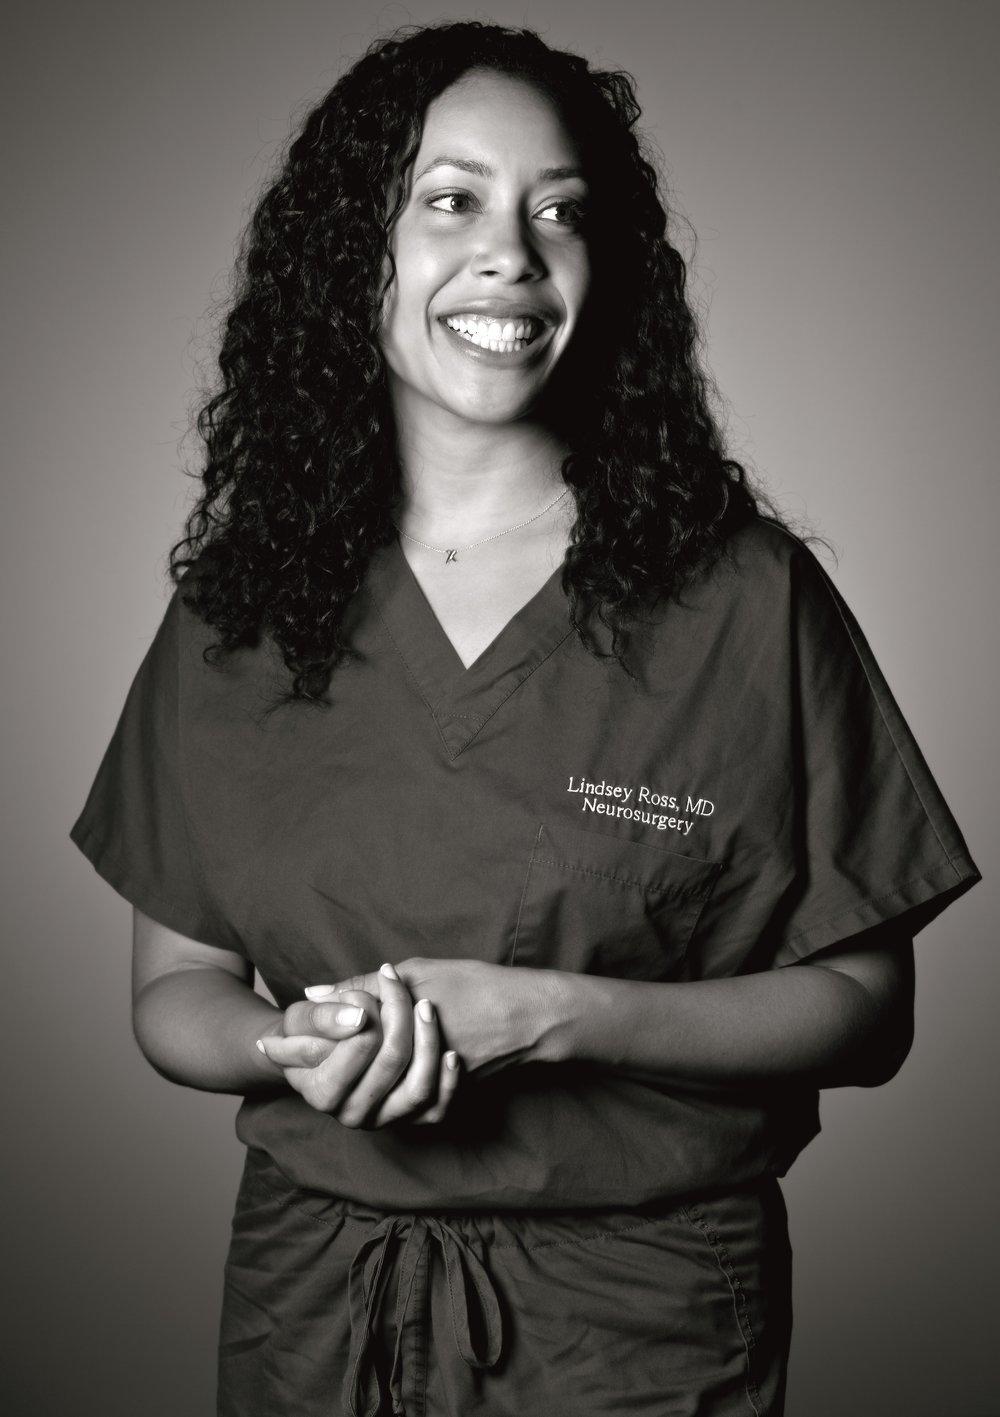 Lindsey Ross, MD